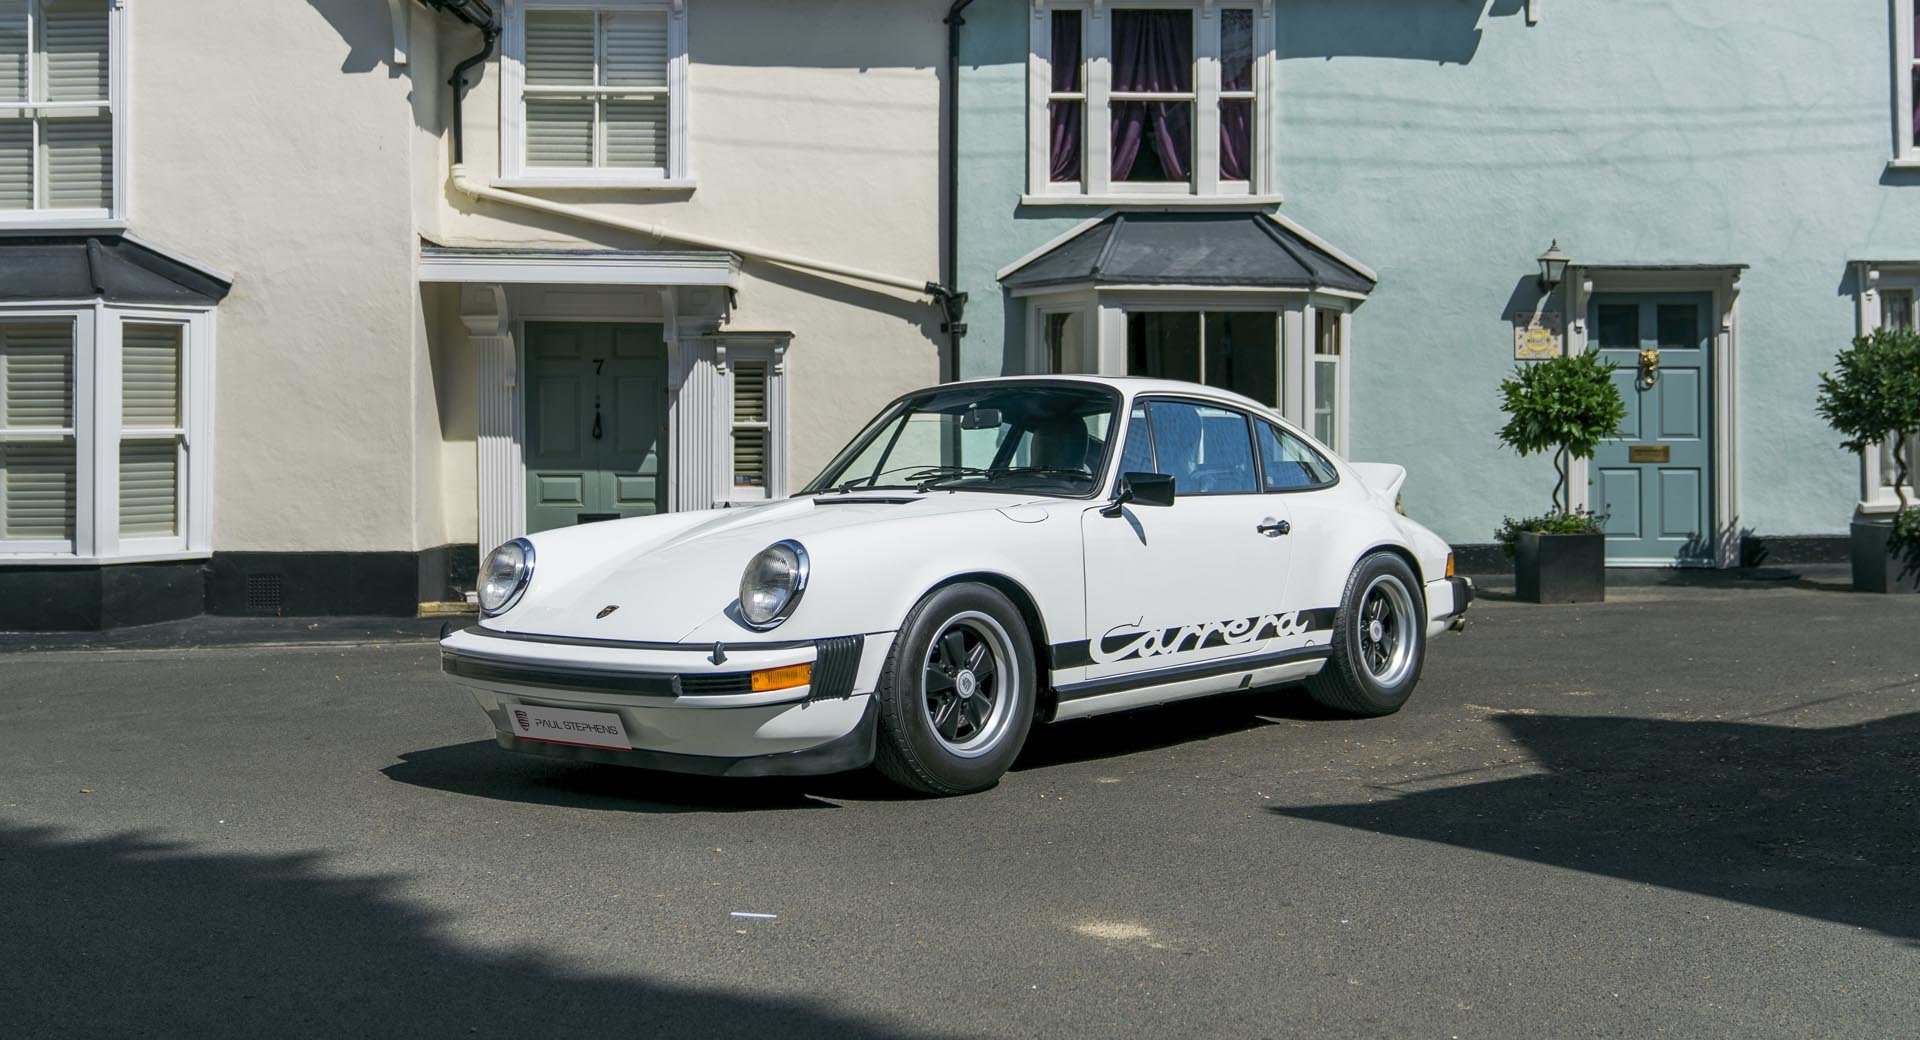 1974 Porsche 911 2.7 MFI SOLD (picture 1 of 6)